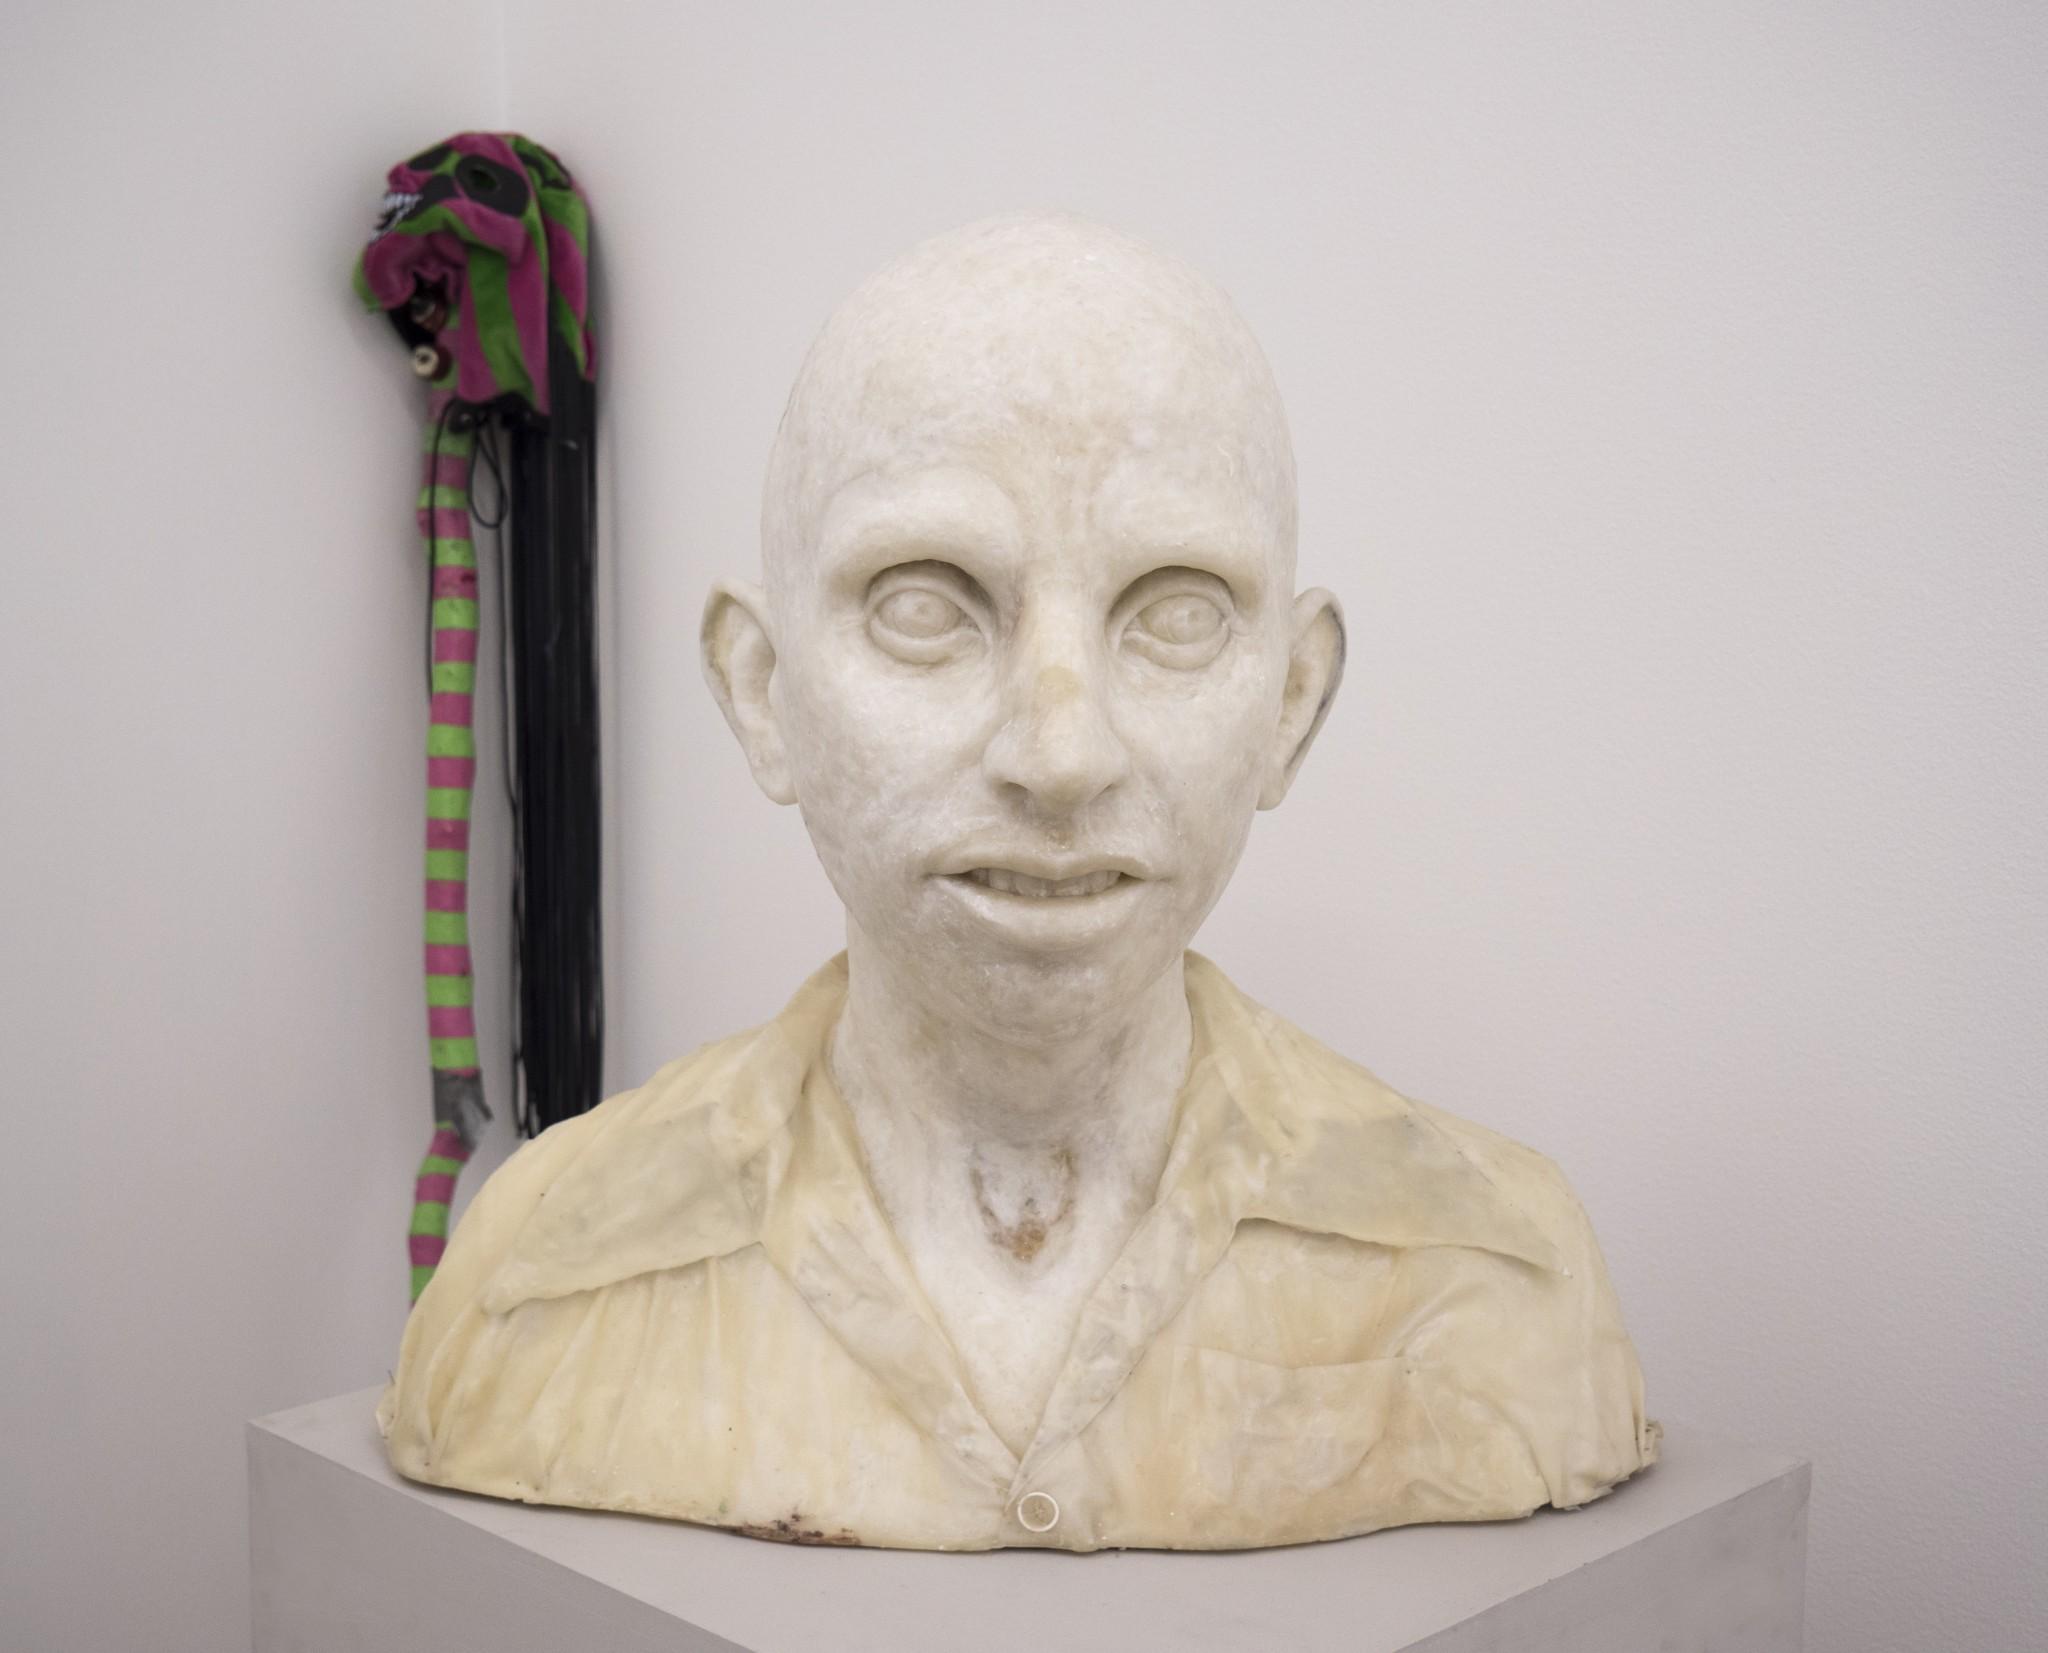 Måns, Hanna Beling, wax